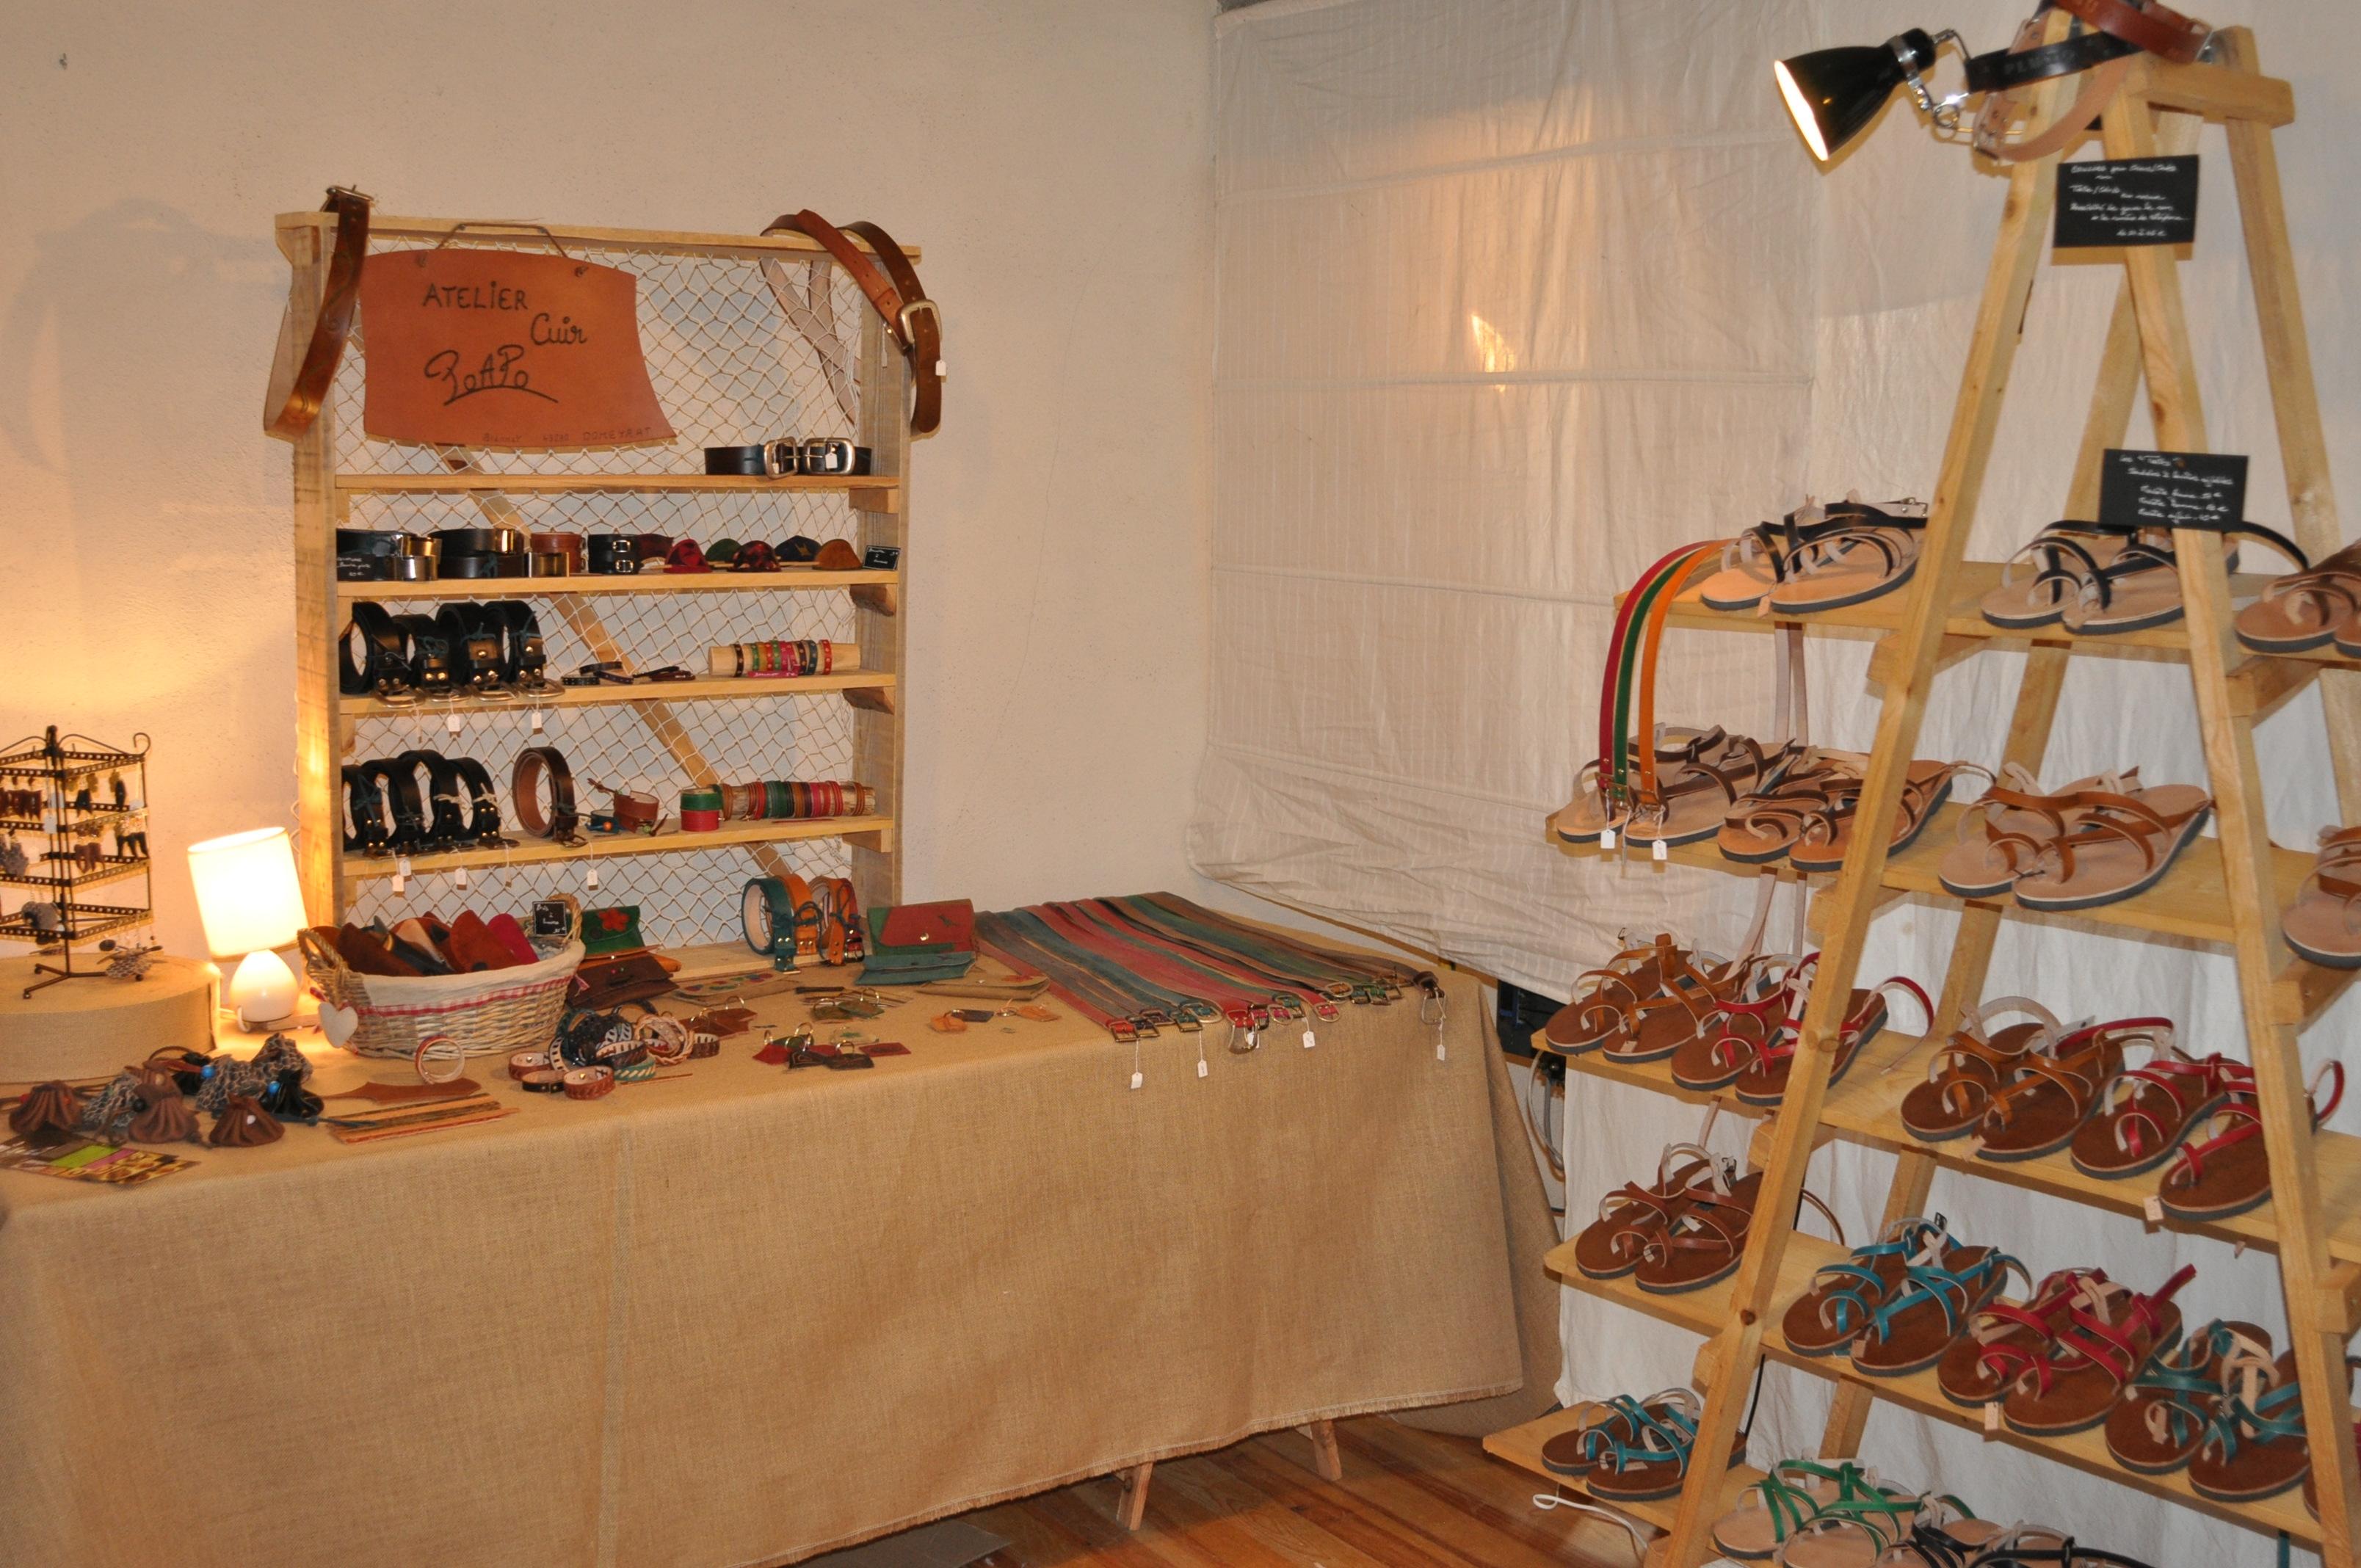 Atelier PoAPo